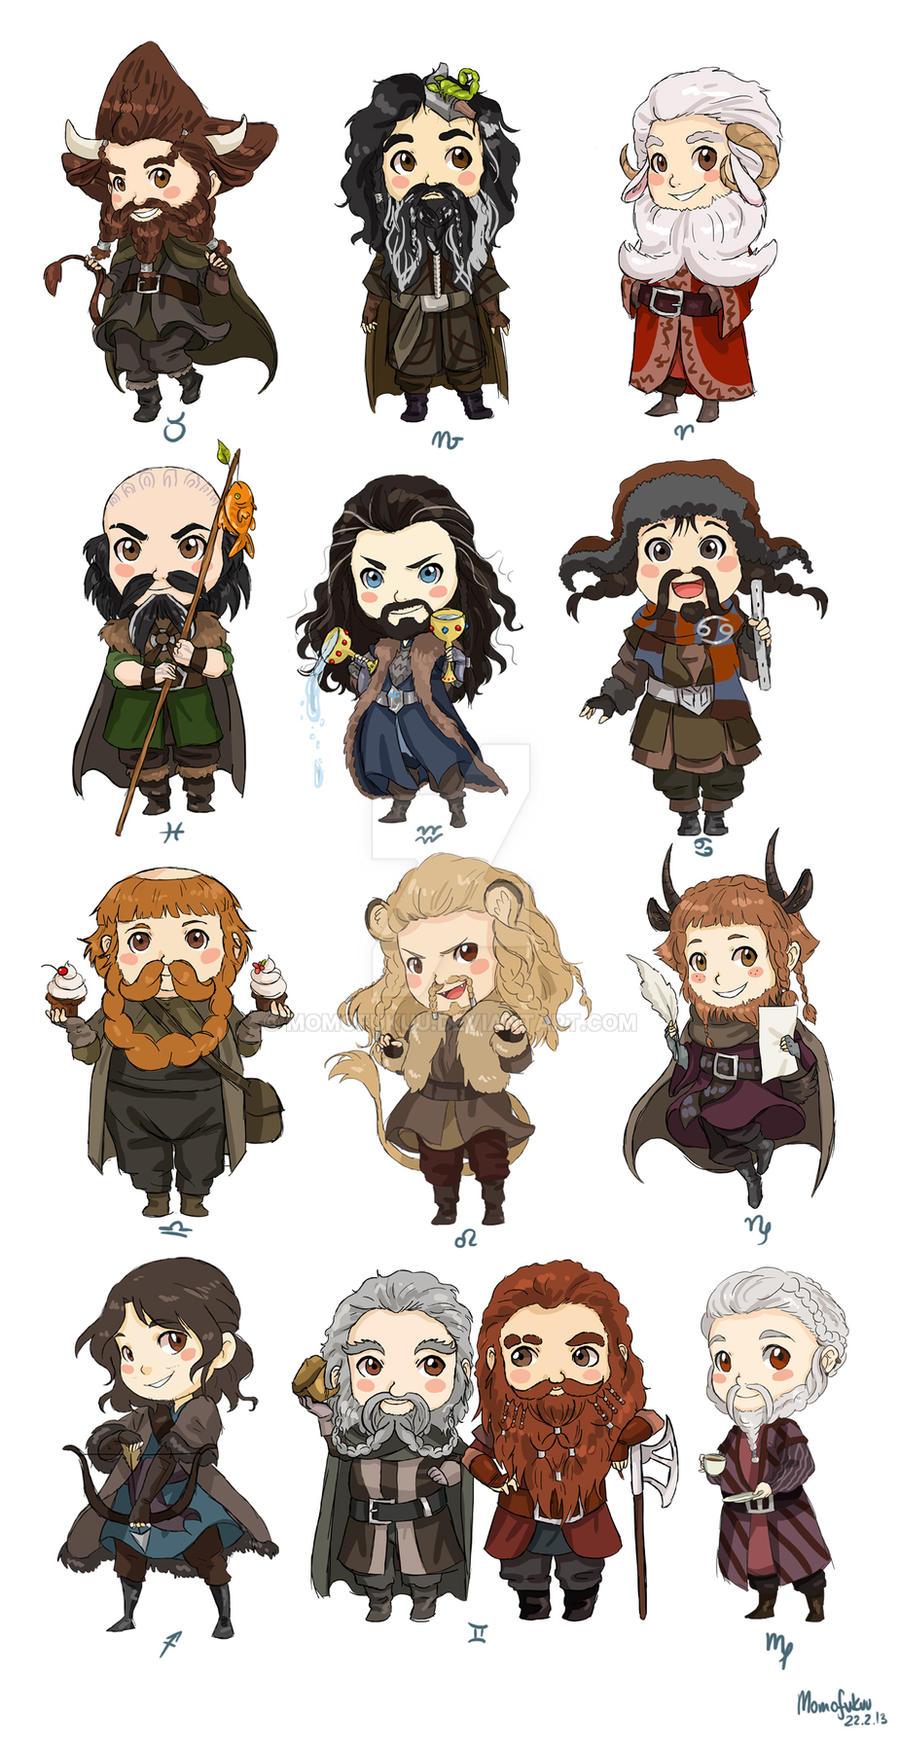 Chibi Zodiac Dwarves by momofukuu